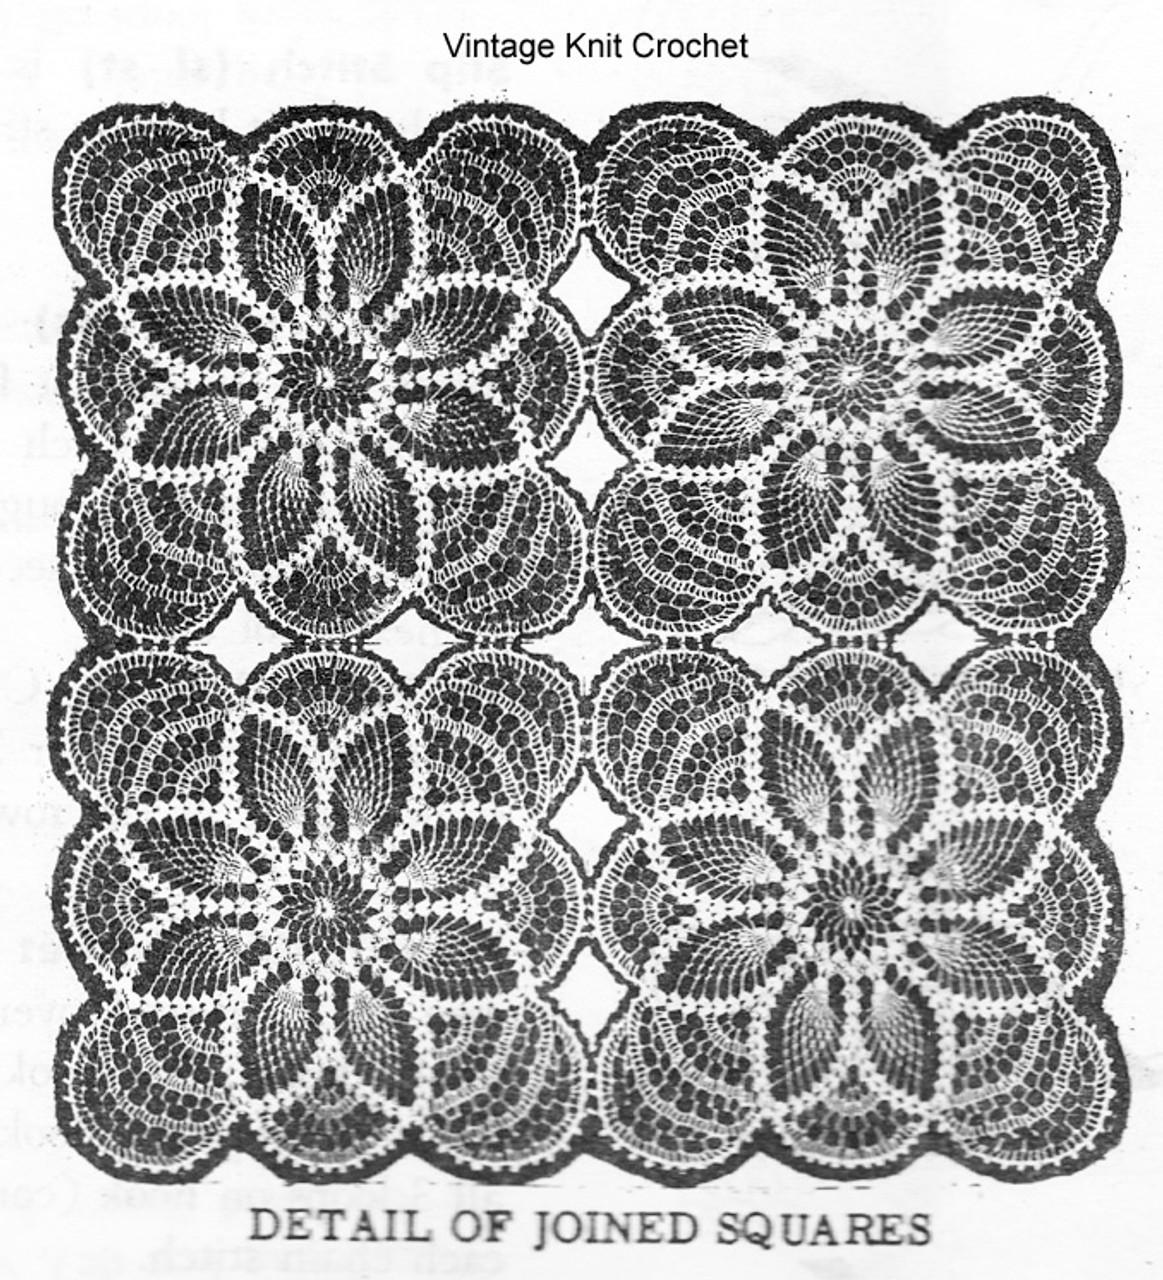 Pineapple crochet cloth pattern, Mail Order Design 530